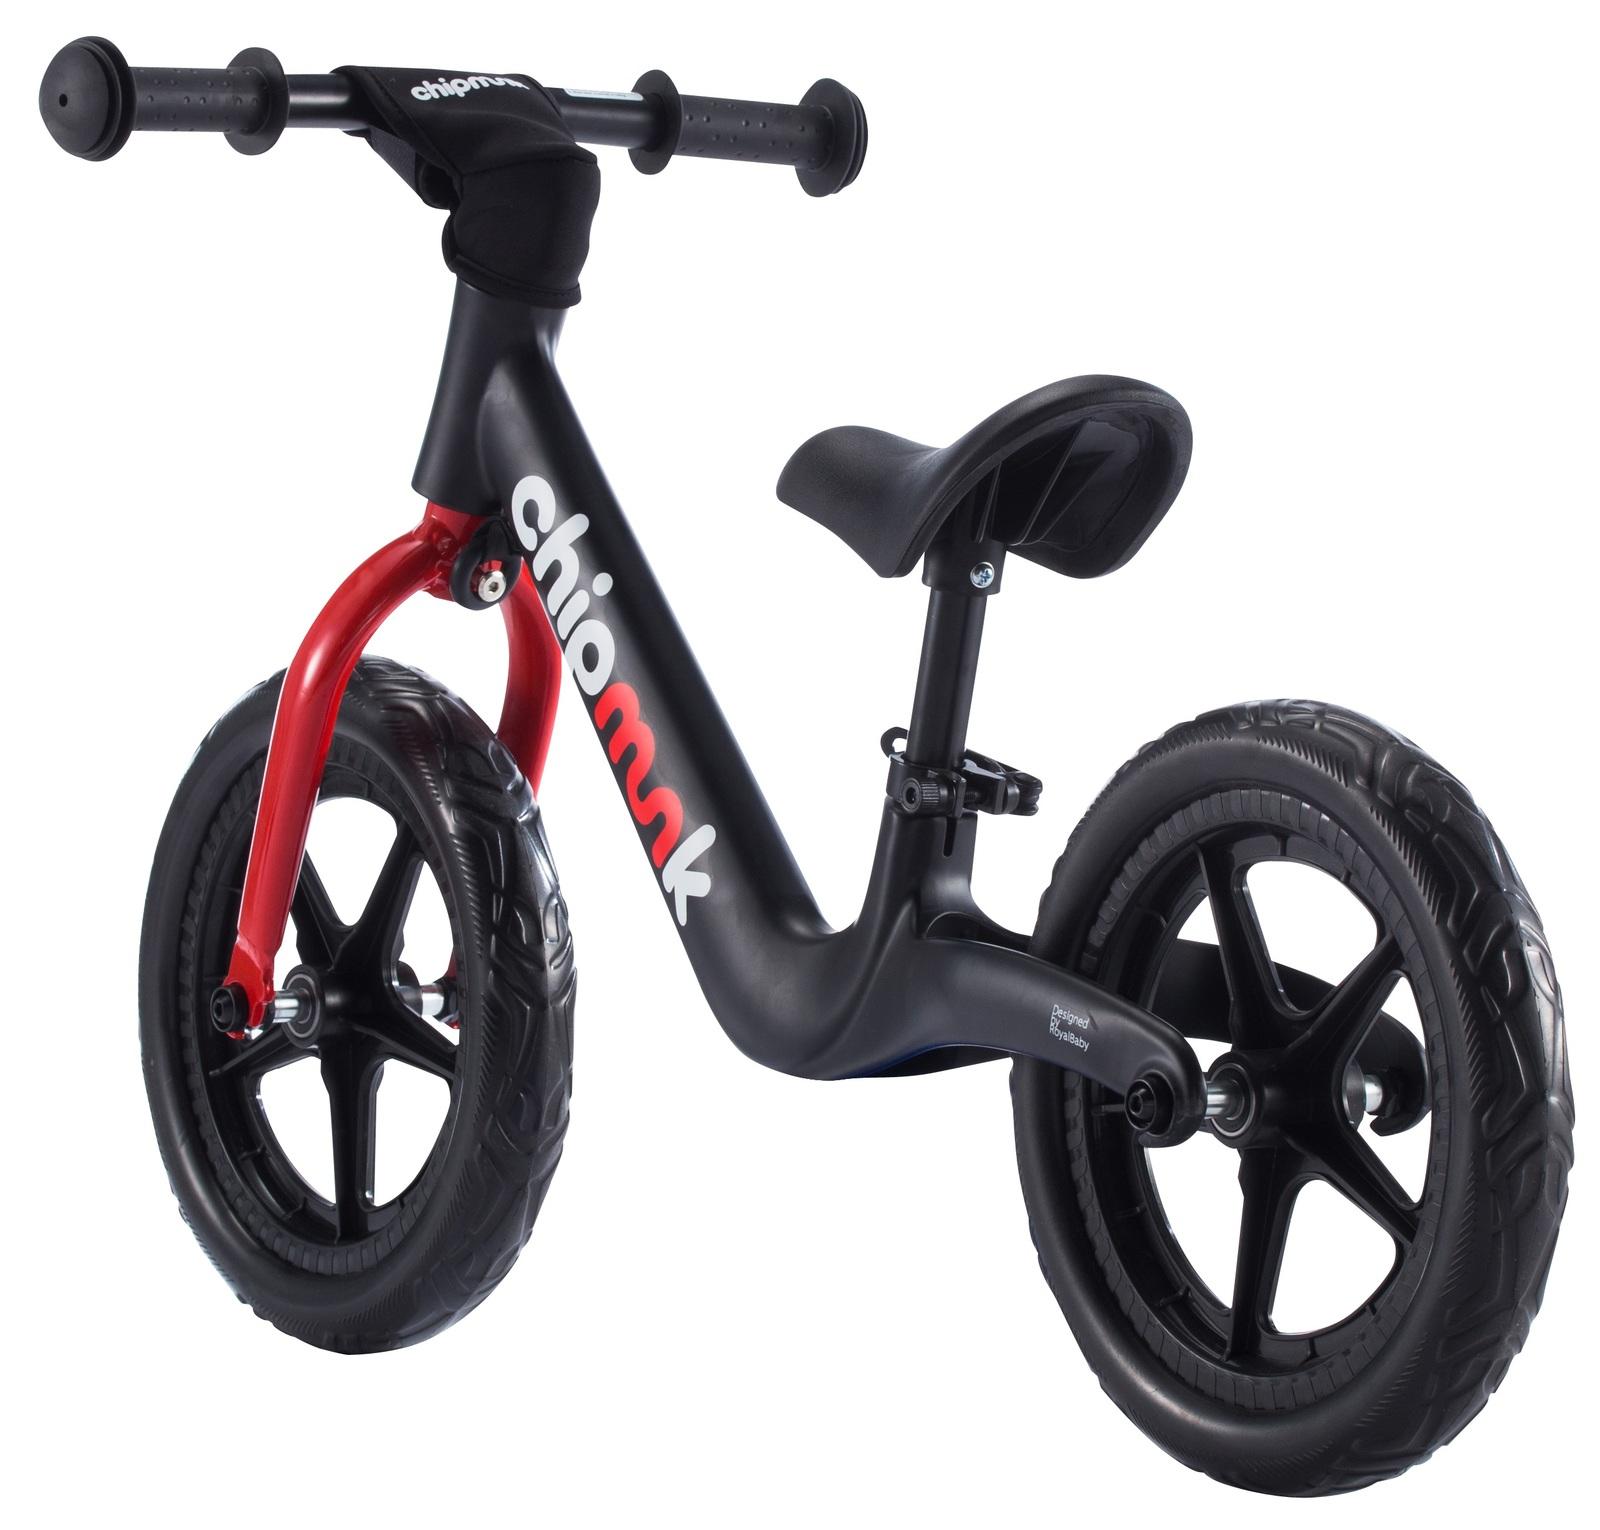 RoyalBaby: Chipmunk Balance Bike - Black image